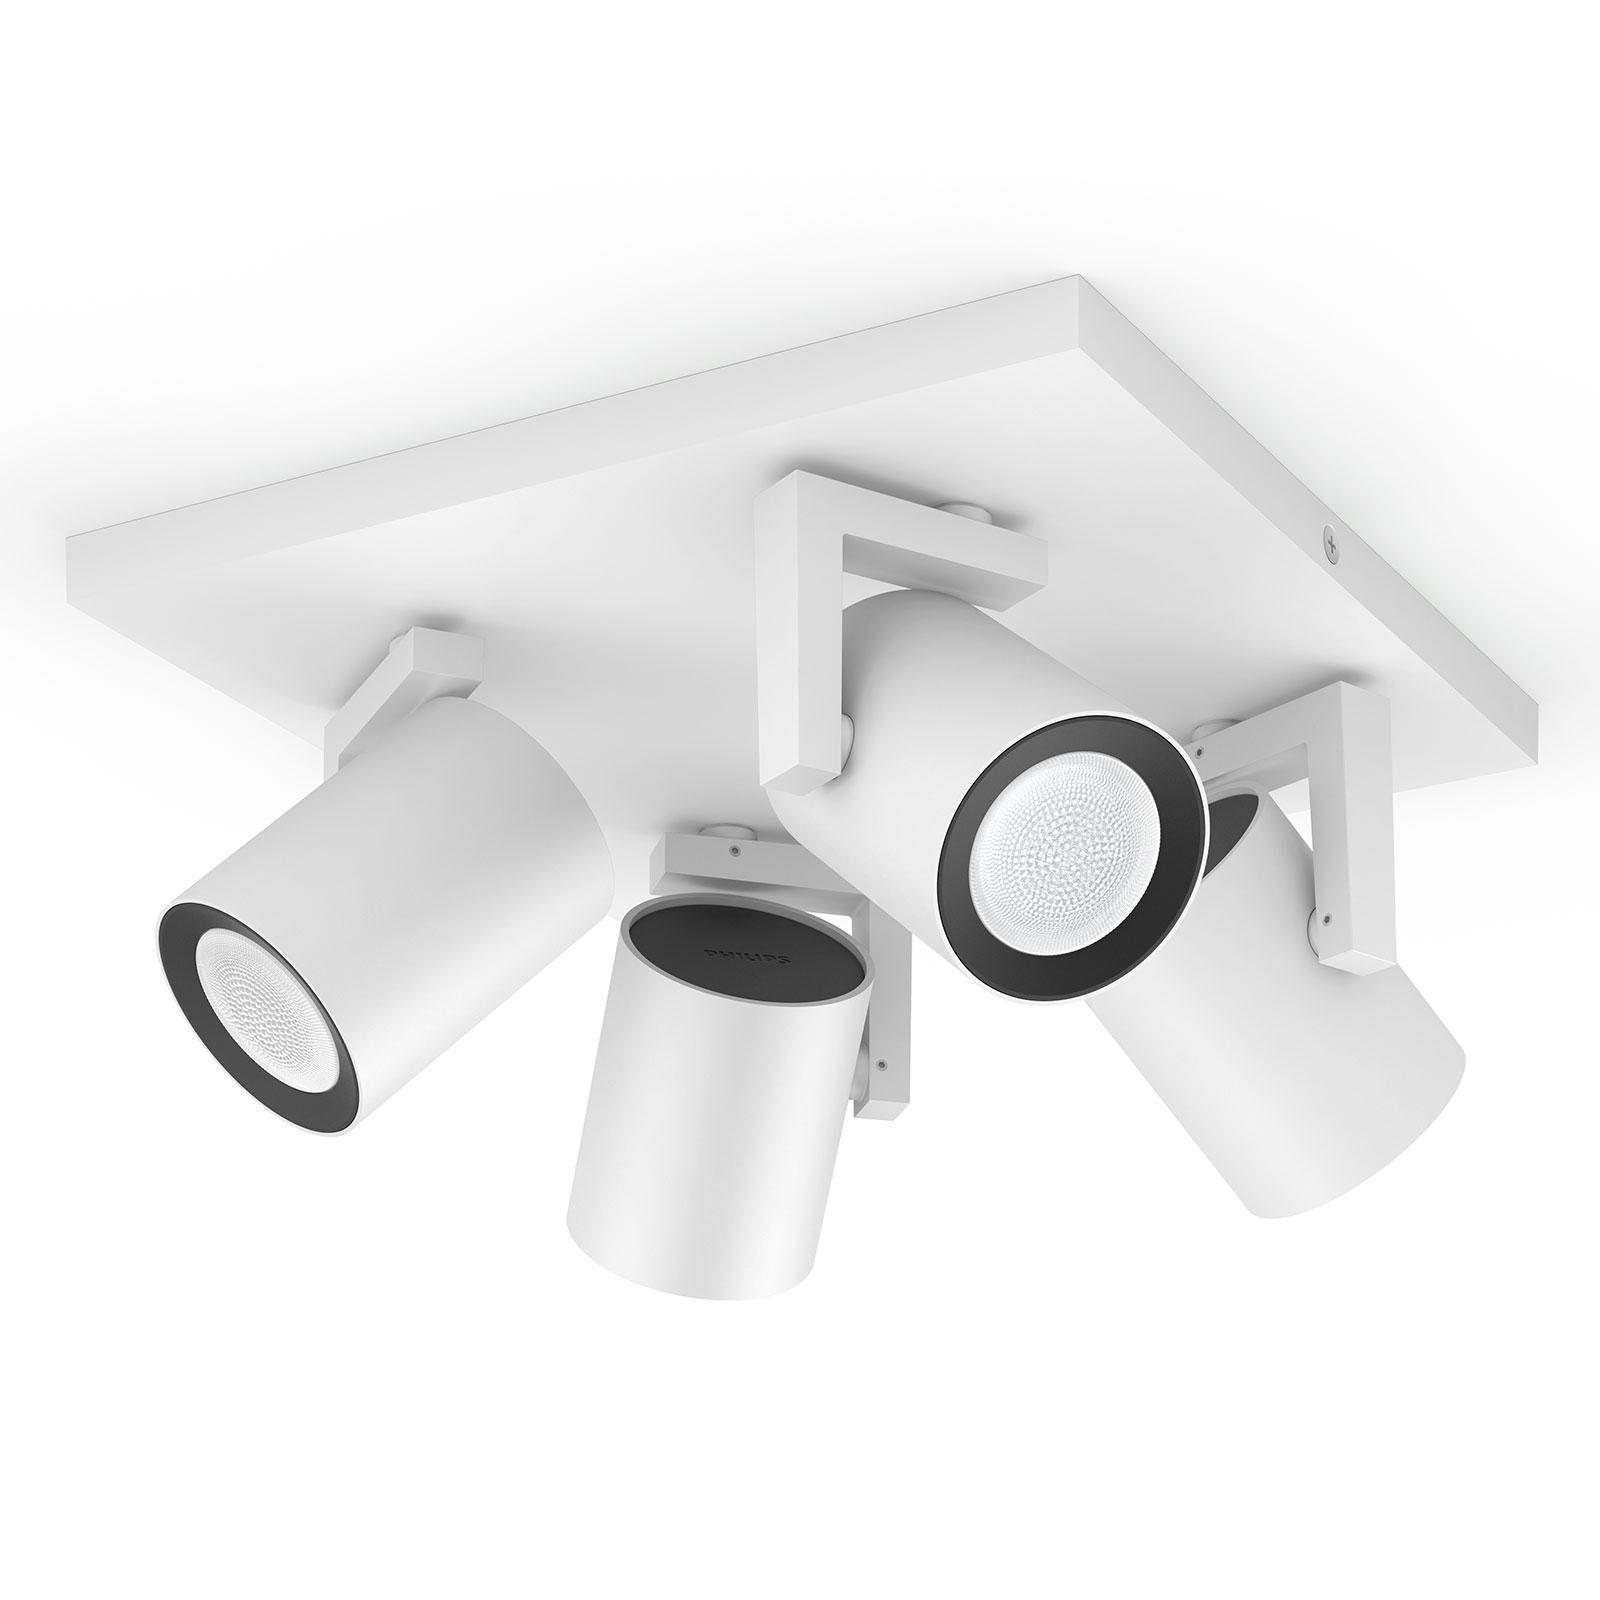 Philips Hue Argenta LED-Spot vierflammig weiß